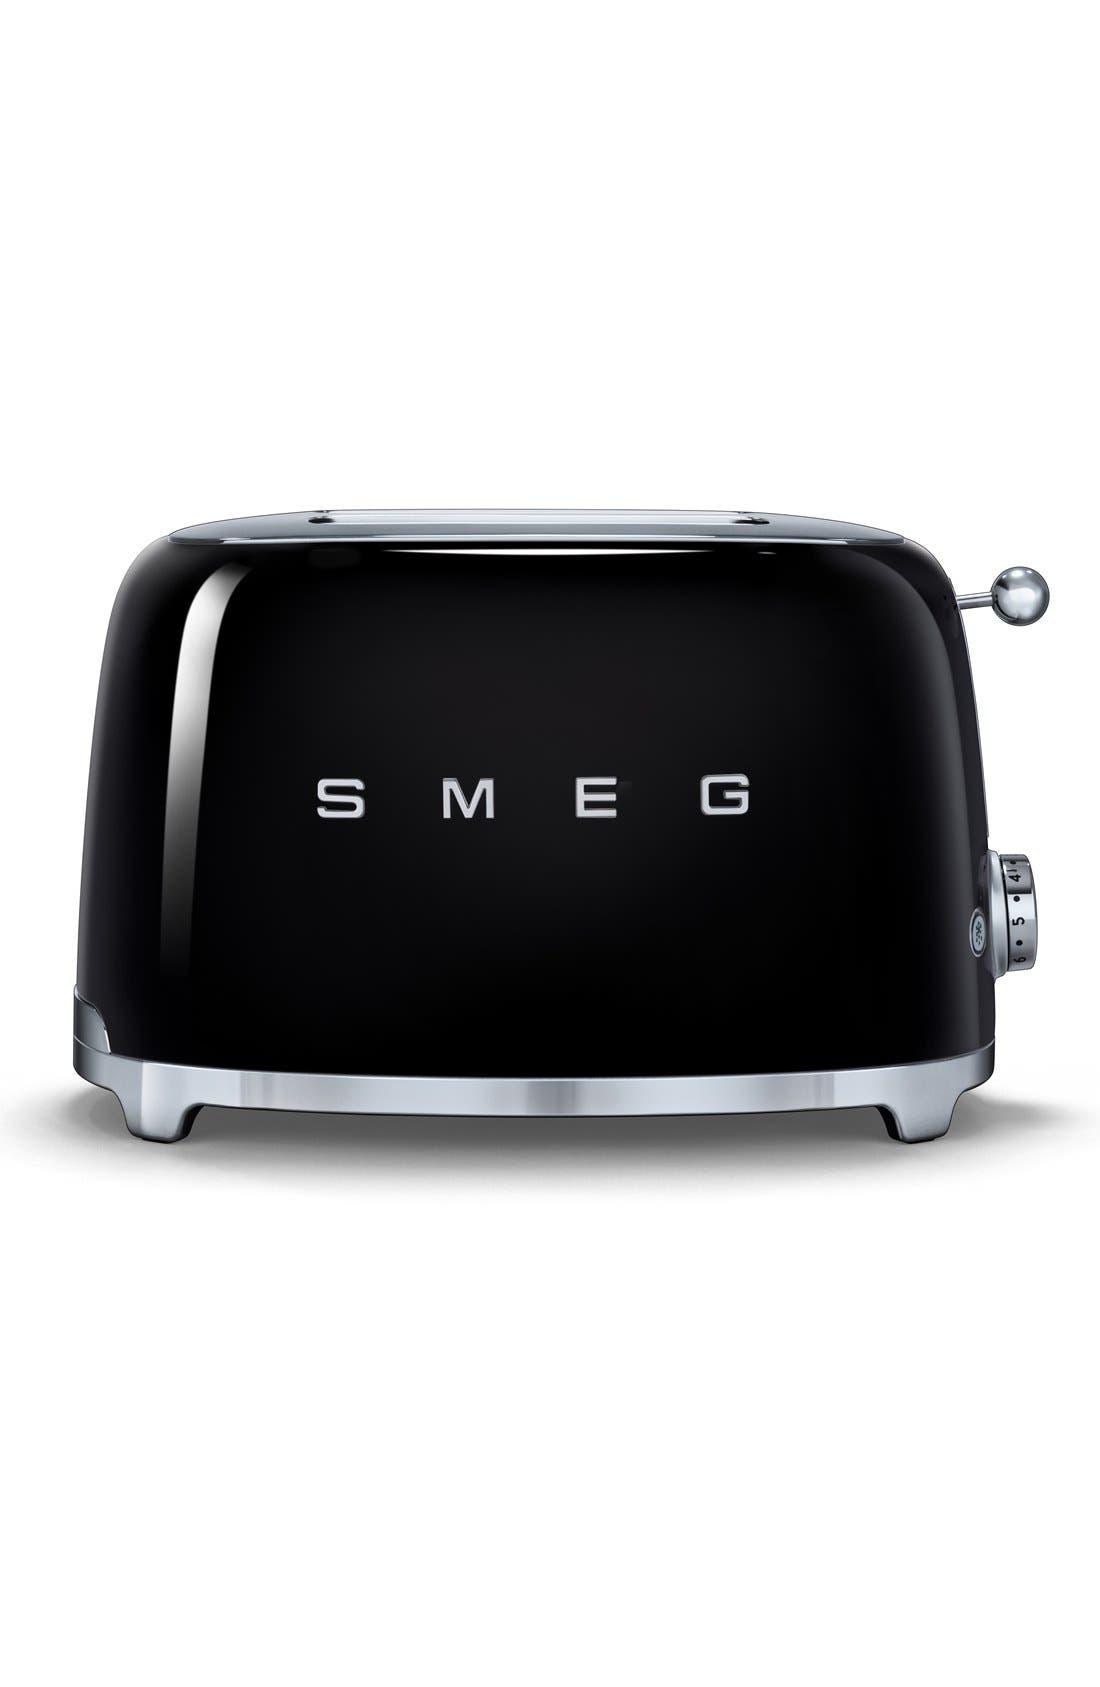 Main Image - smeg '50s Retro Style Aesthetic' Two-Slice Toaster